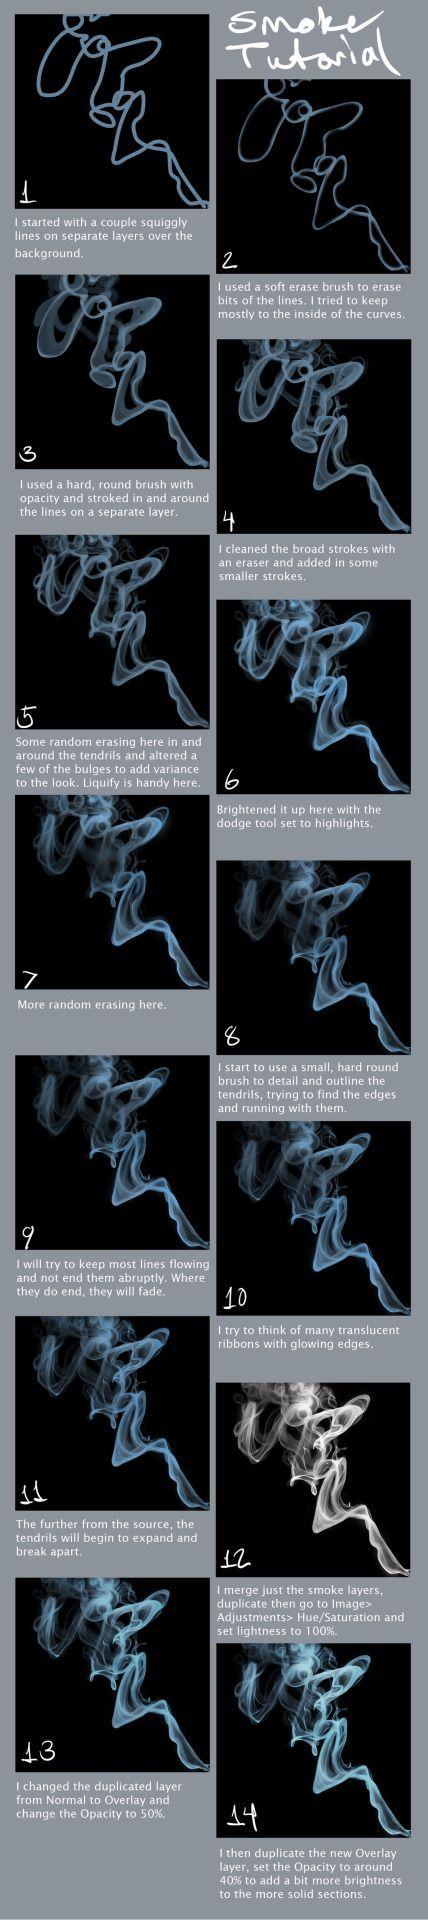 Smoke Tutorial by portohle - How to Art